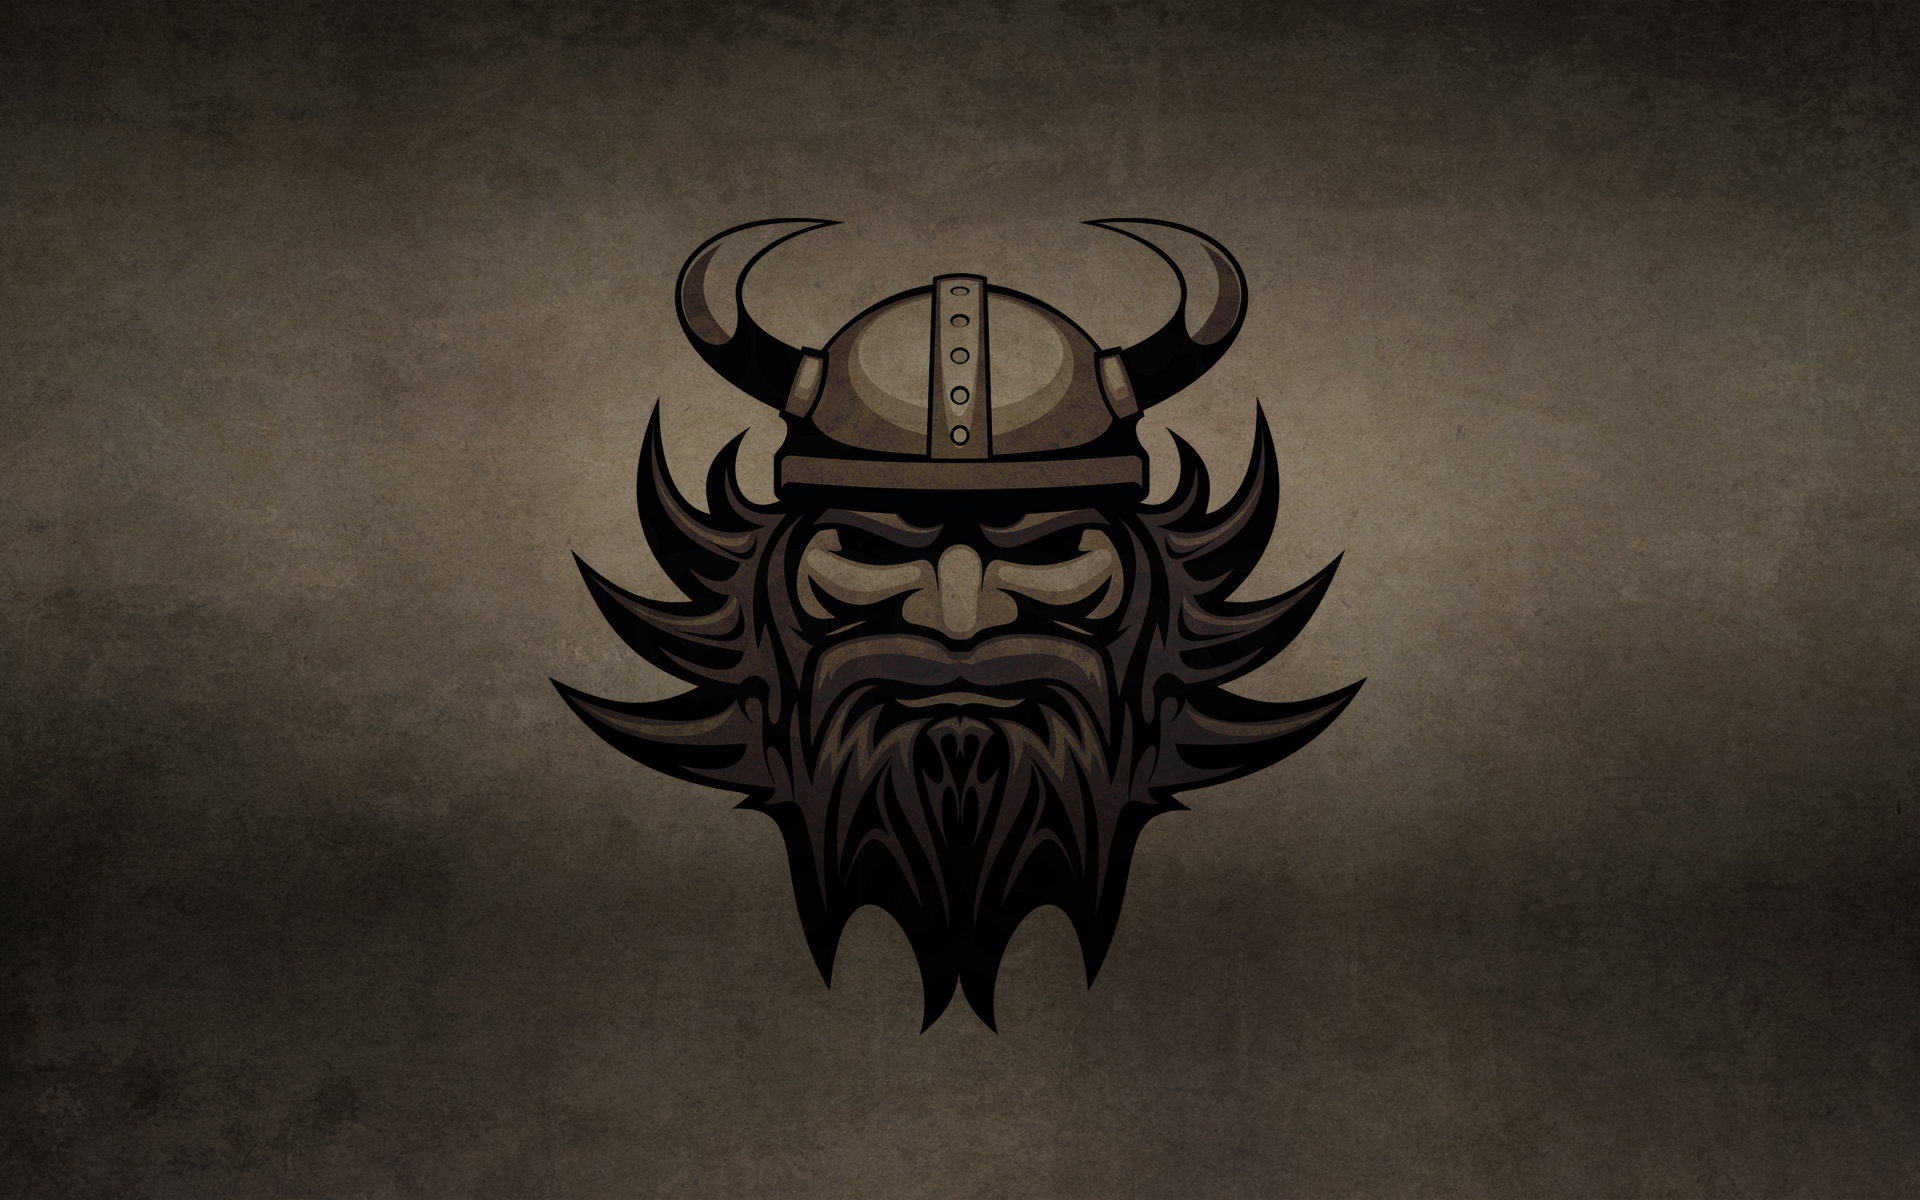 Обои викинг, лицо, волосы, борода